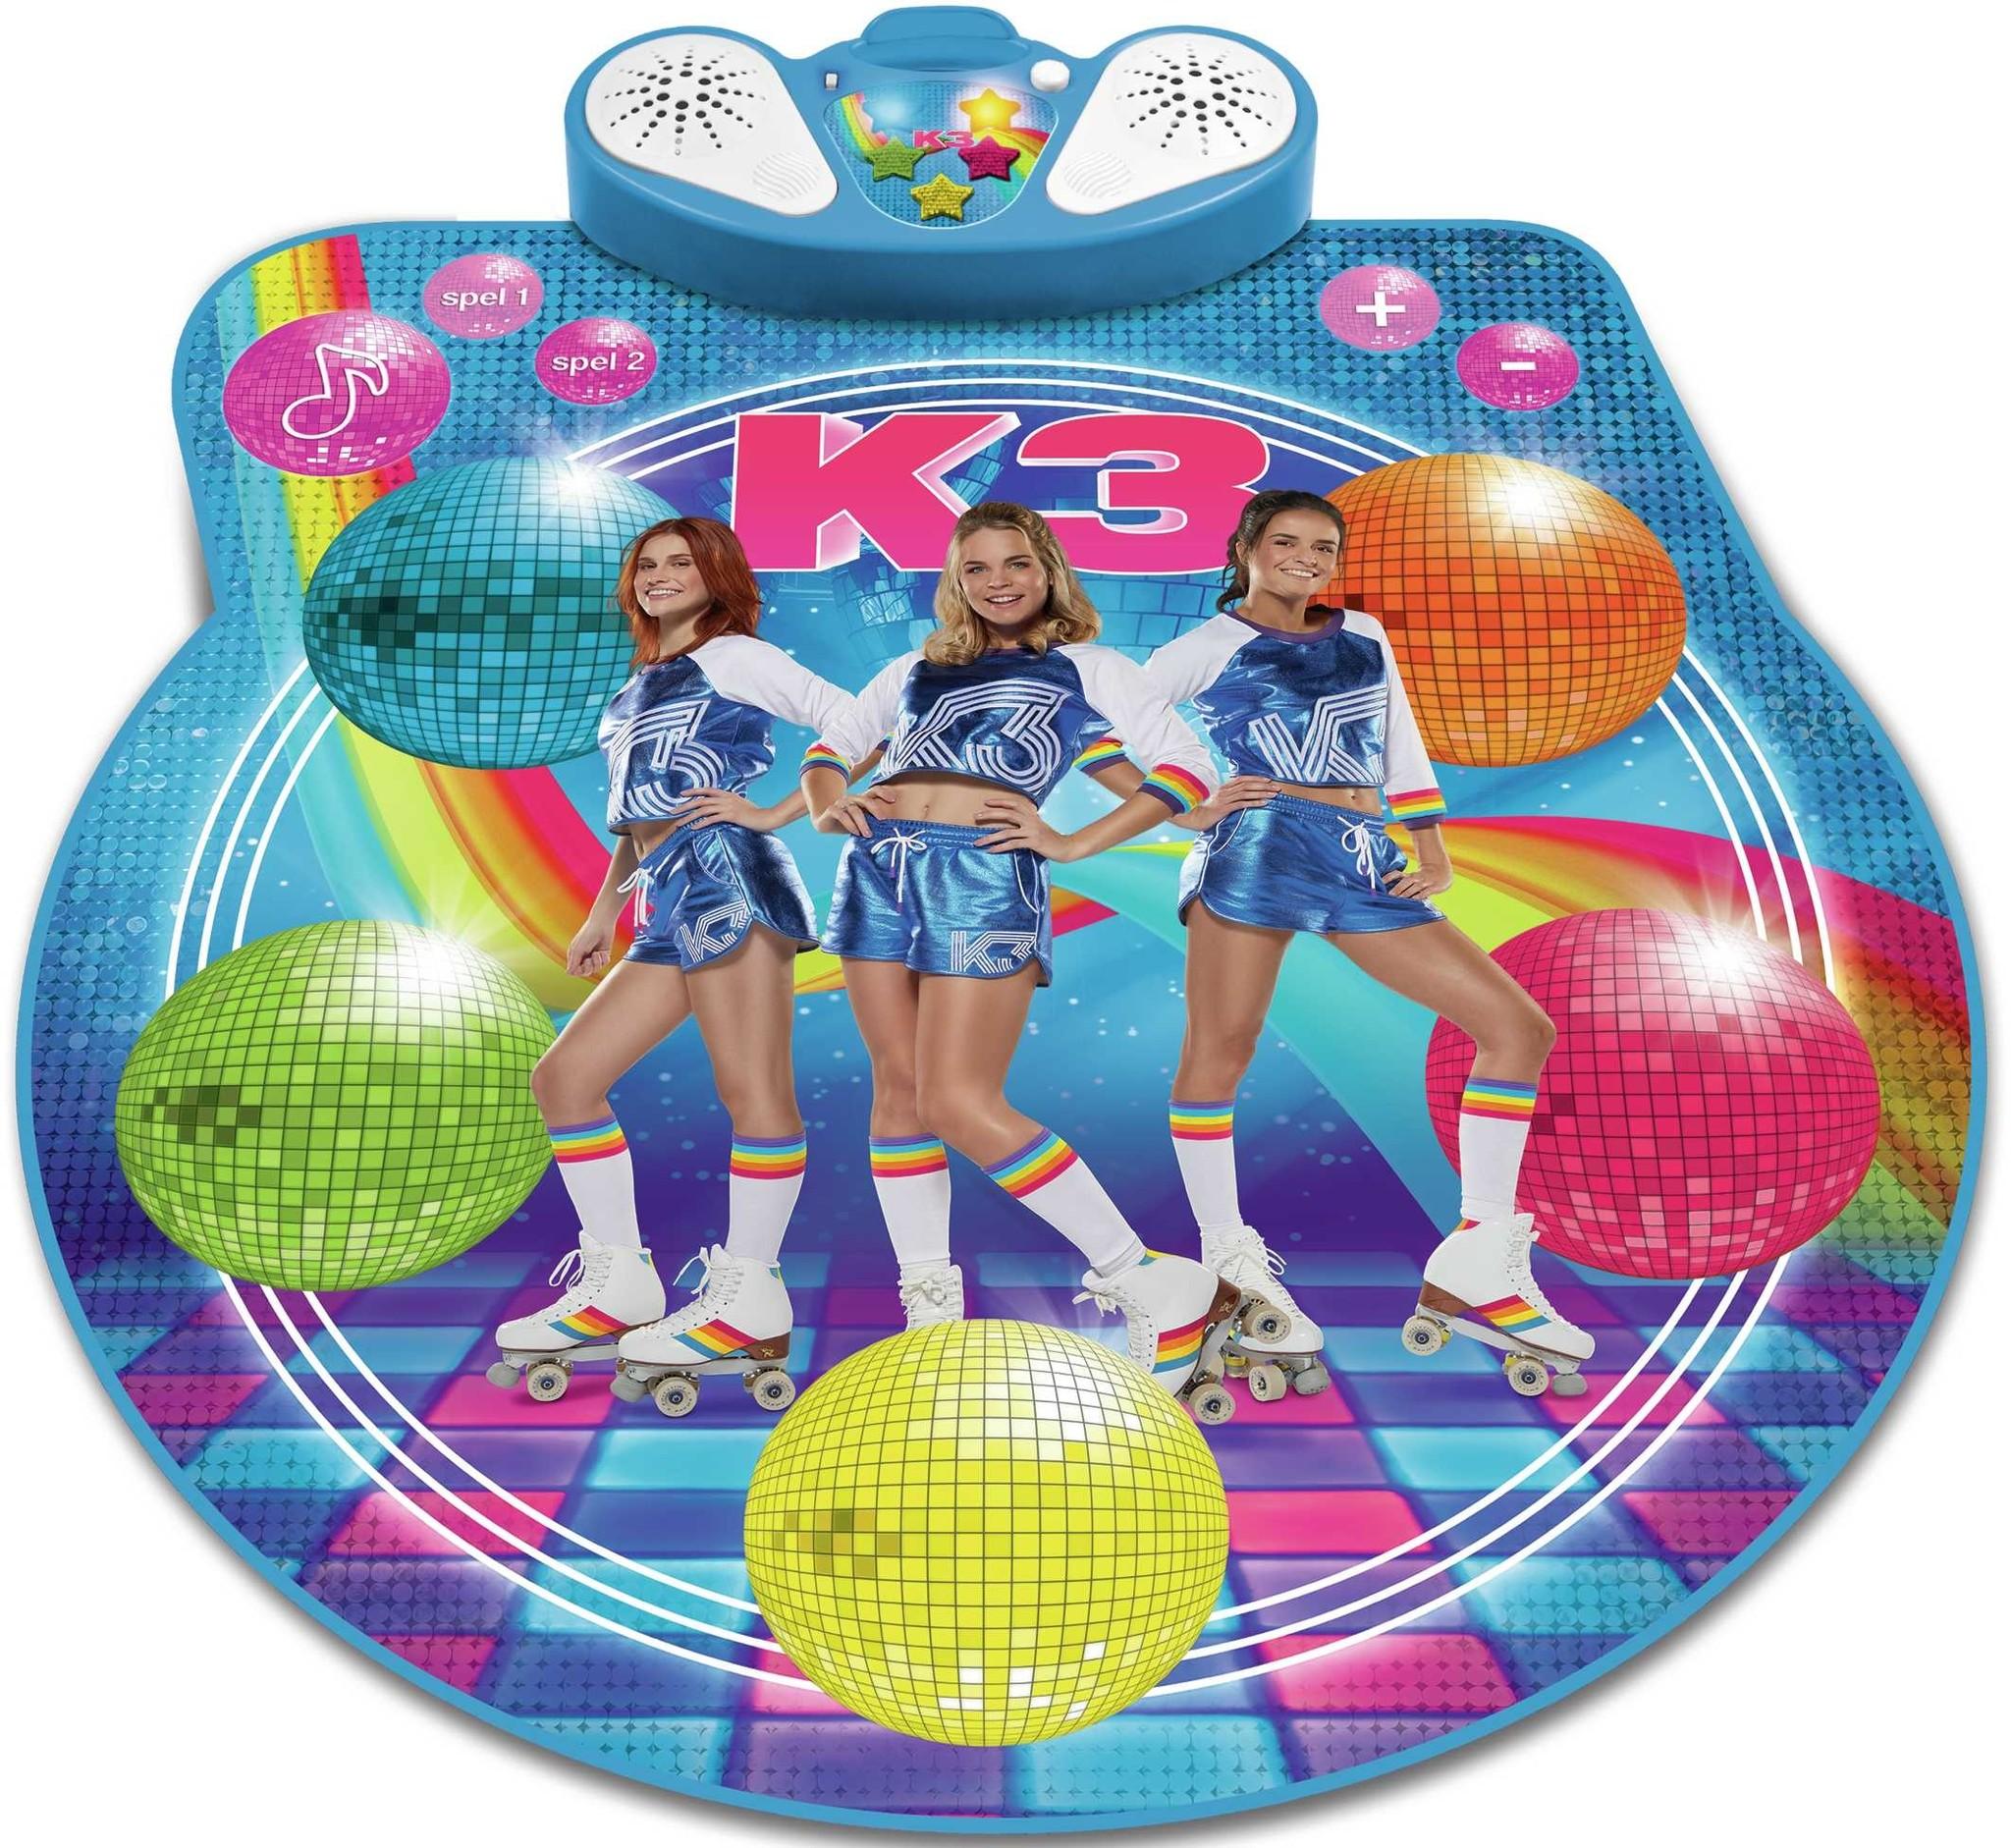 Dansmat K3: Rollerdisco 2.0